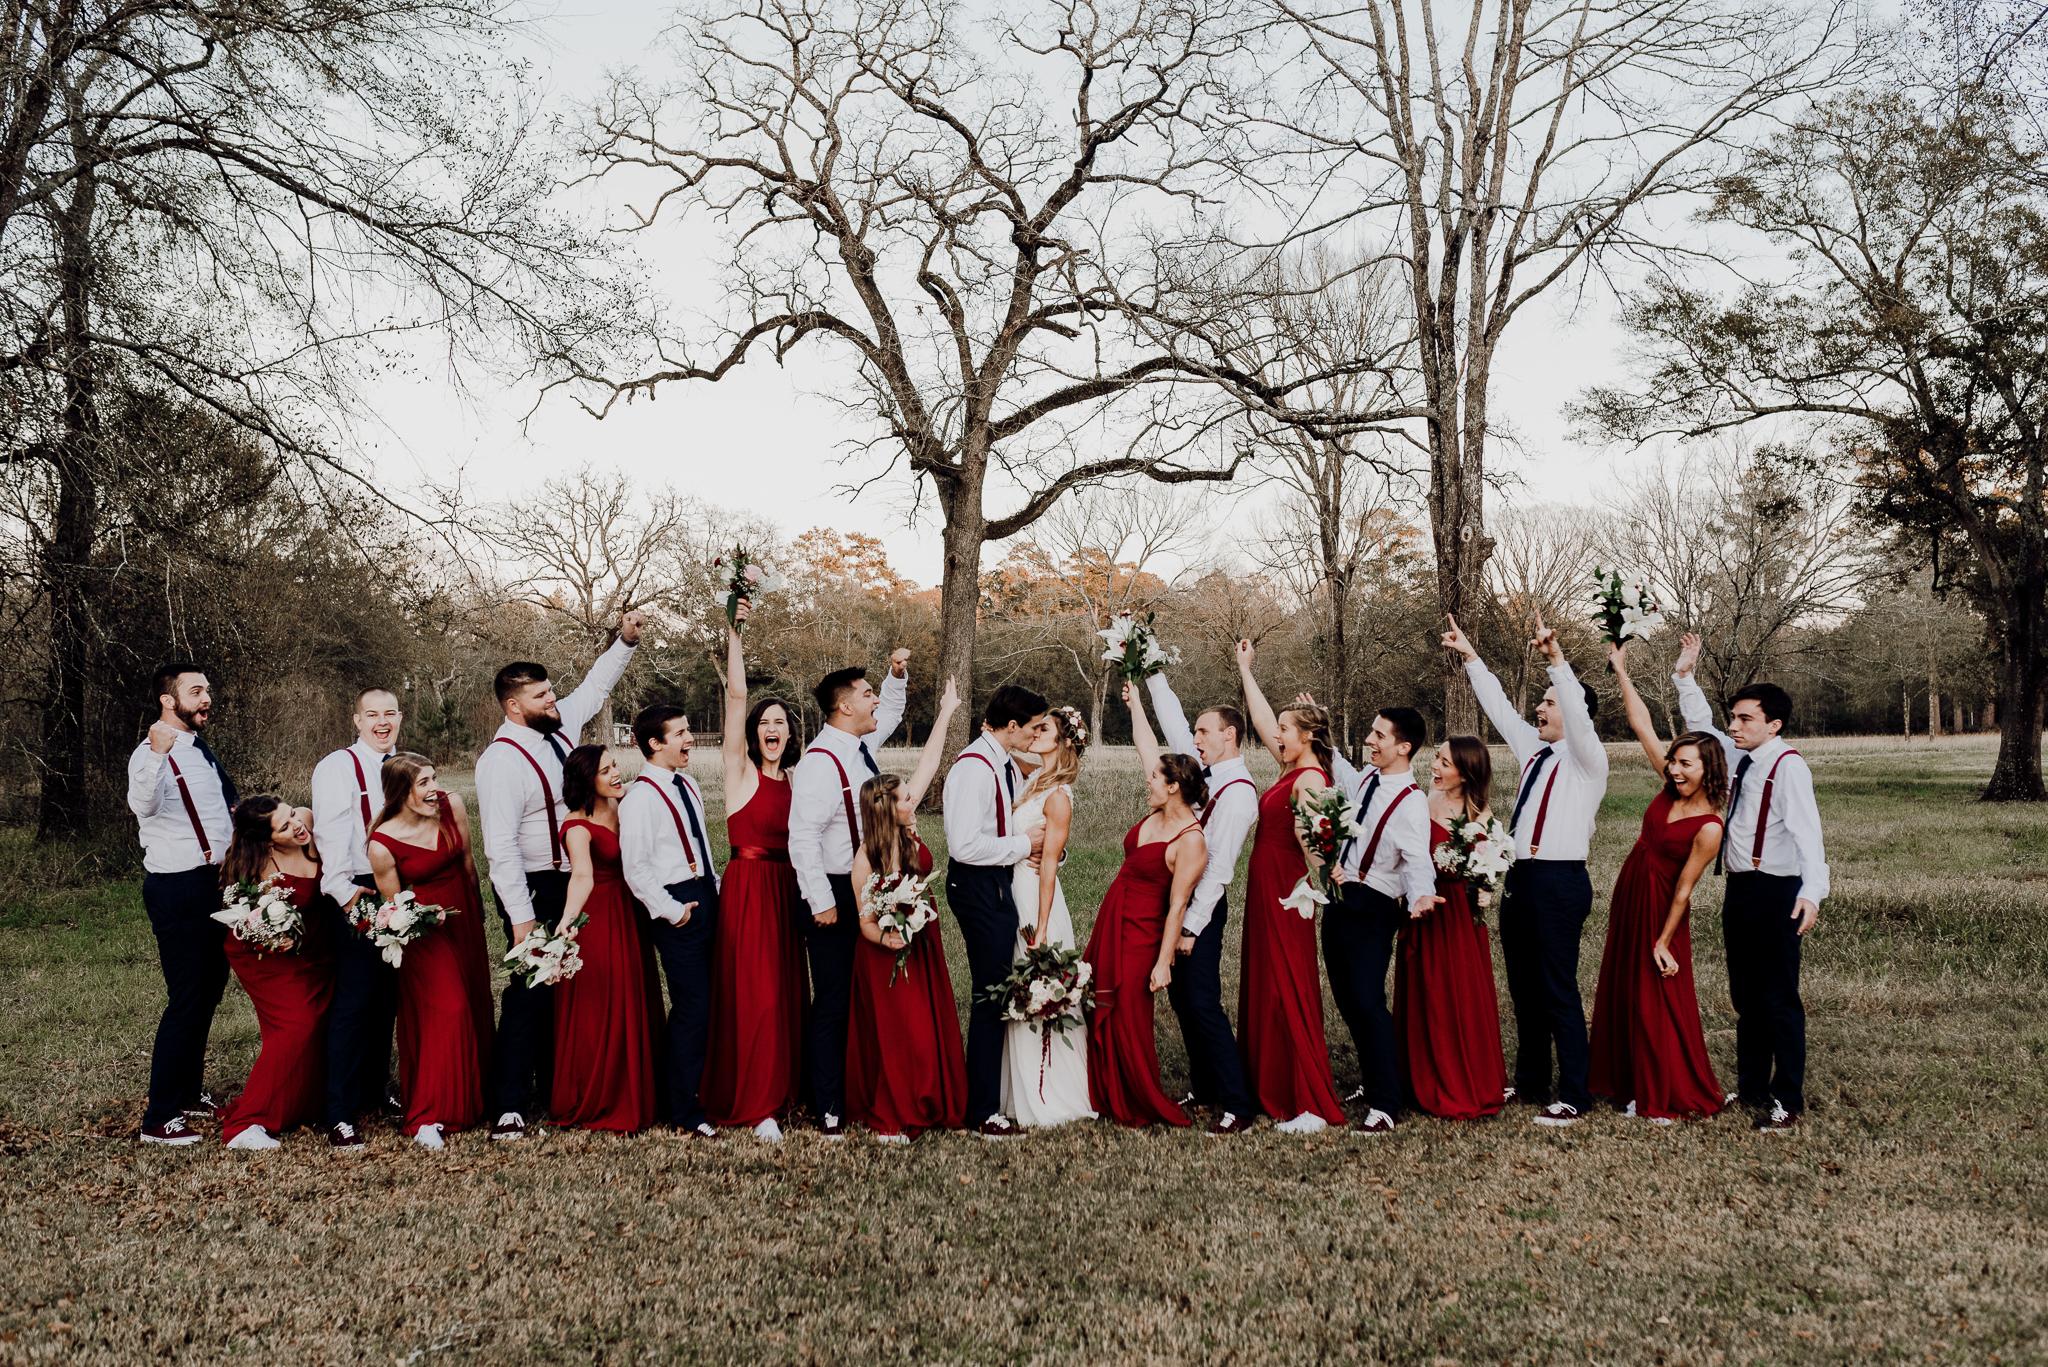 Michelle + Aron-Houston Wedding Photographer-Magnolia Meadows-Winter Wedding | Kristen Giles Photography - 068.jpg